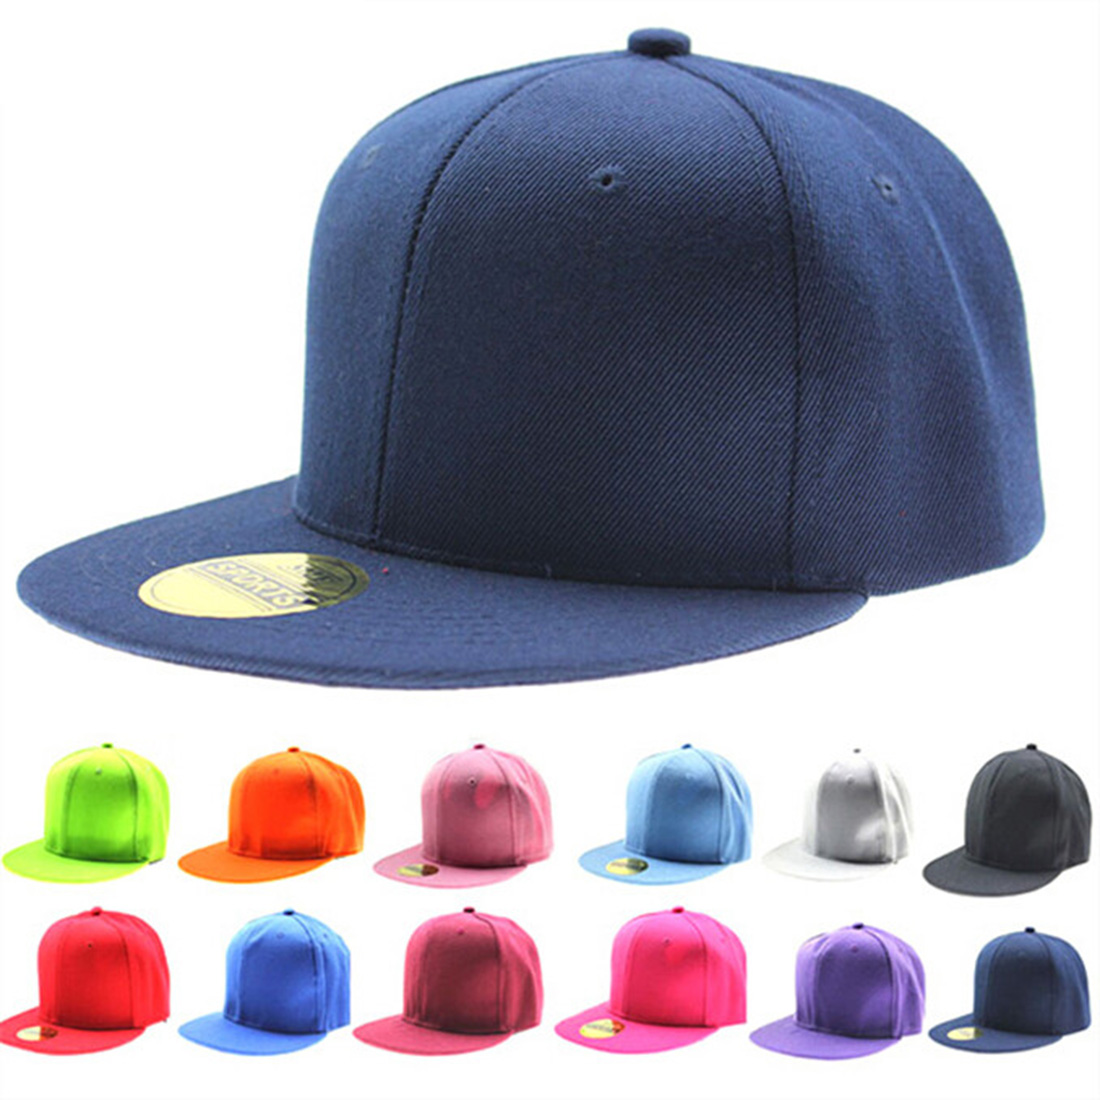 5b6d32181e22d8 Hot Sale Spring Summer Pure Color Caps Flat Hip Hop Style Hat Europe Style  Cowboy Hats Baseball Cap 15 Colors Adjustable